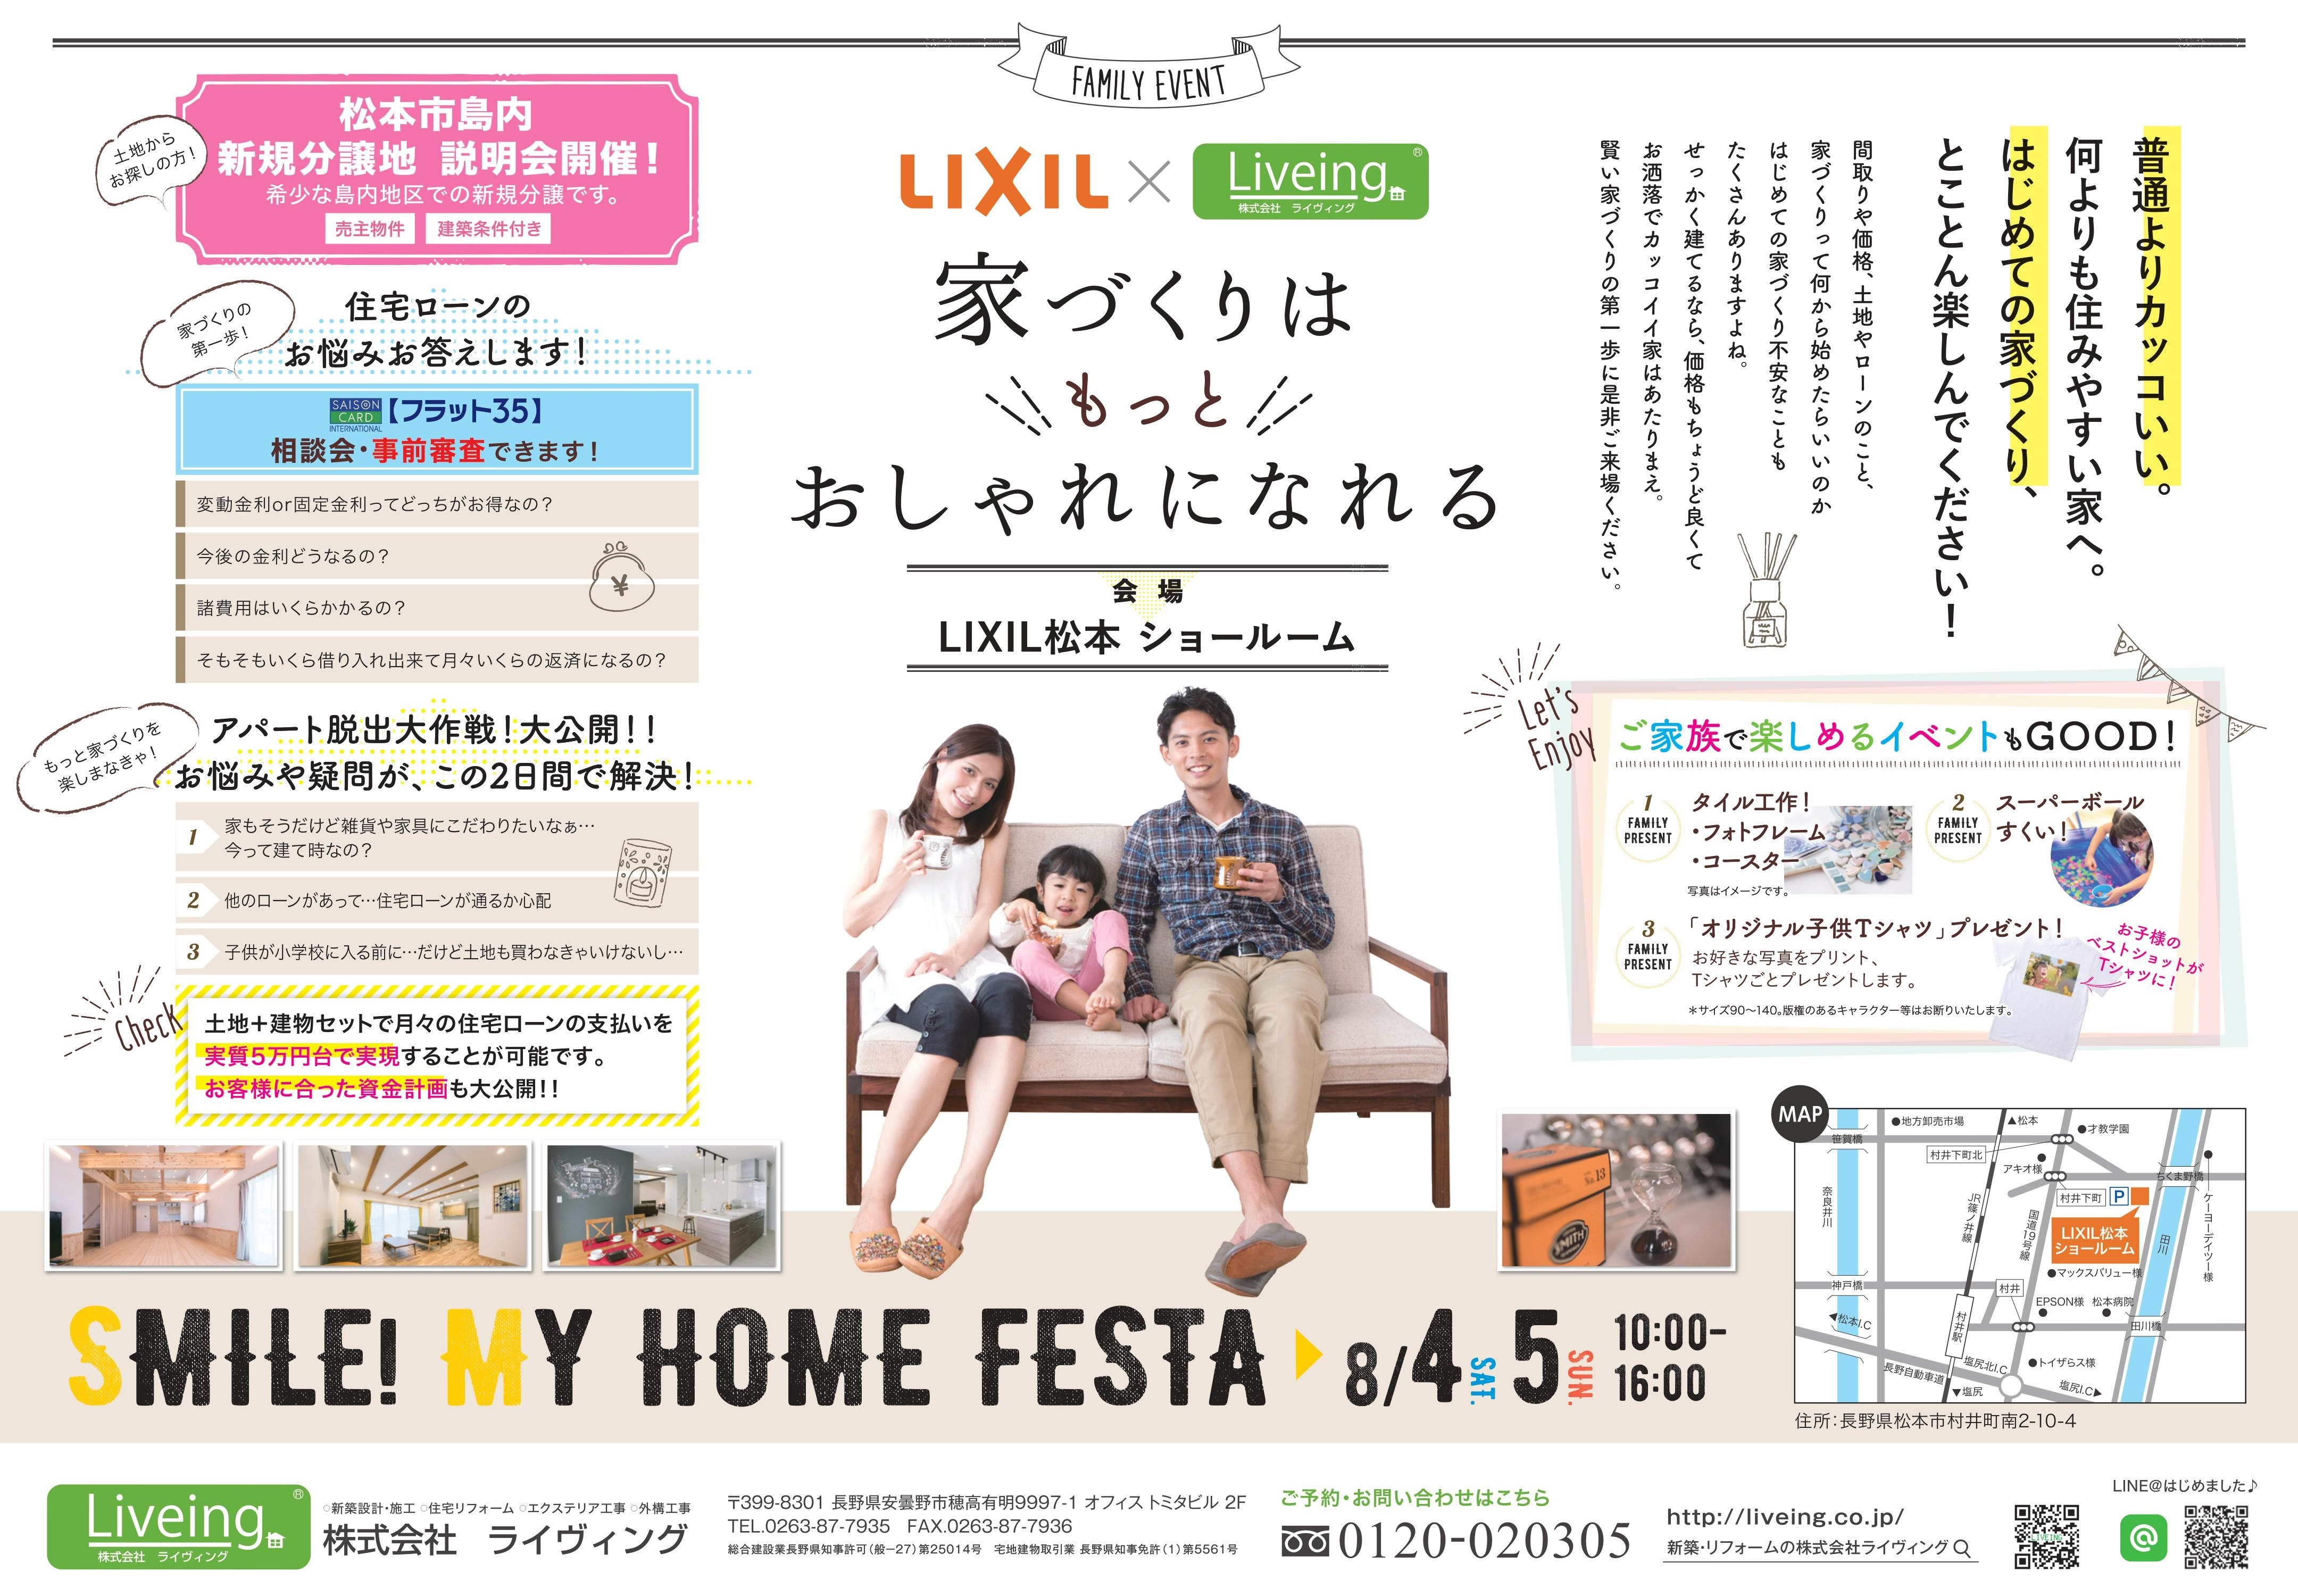 lixil event